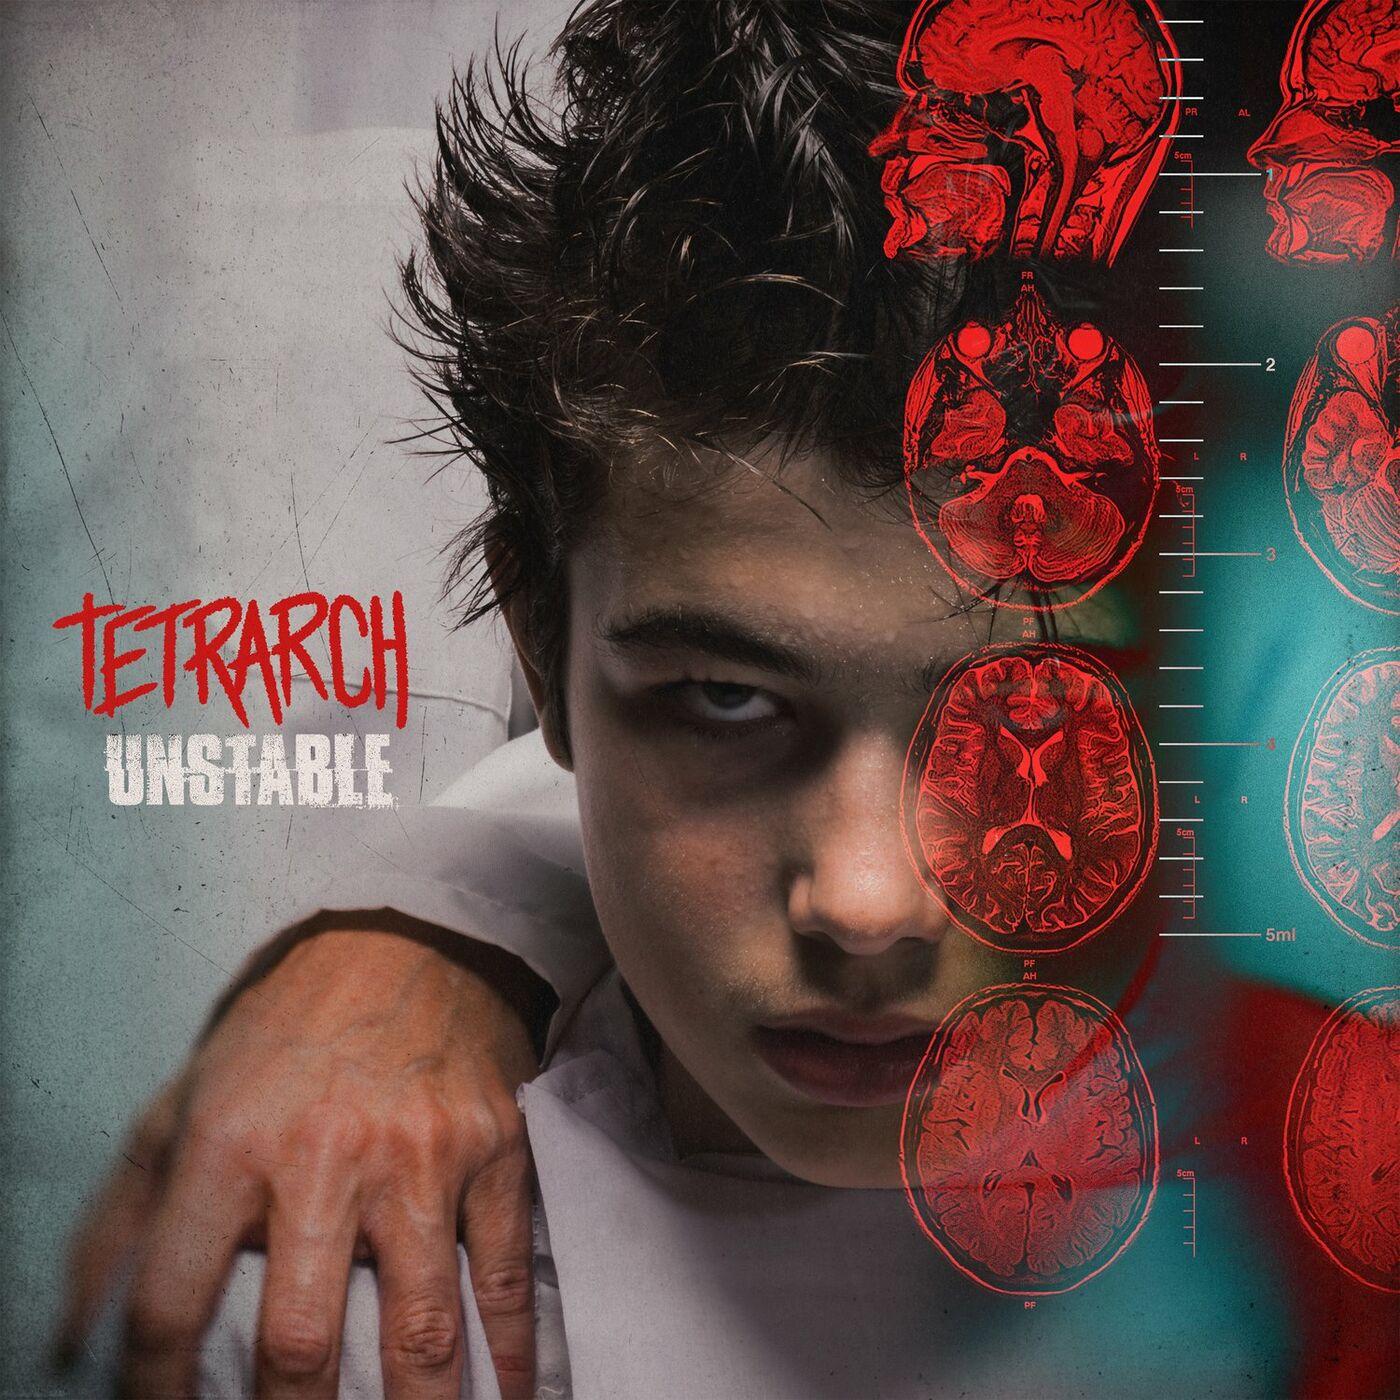 Tetrarch - Negative Noise [single] (2021)